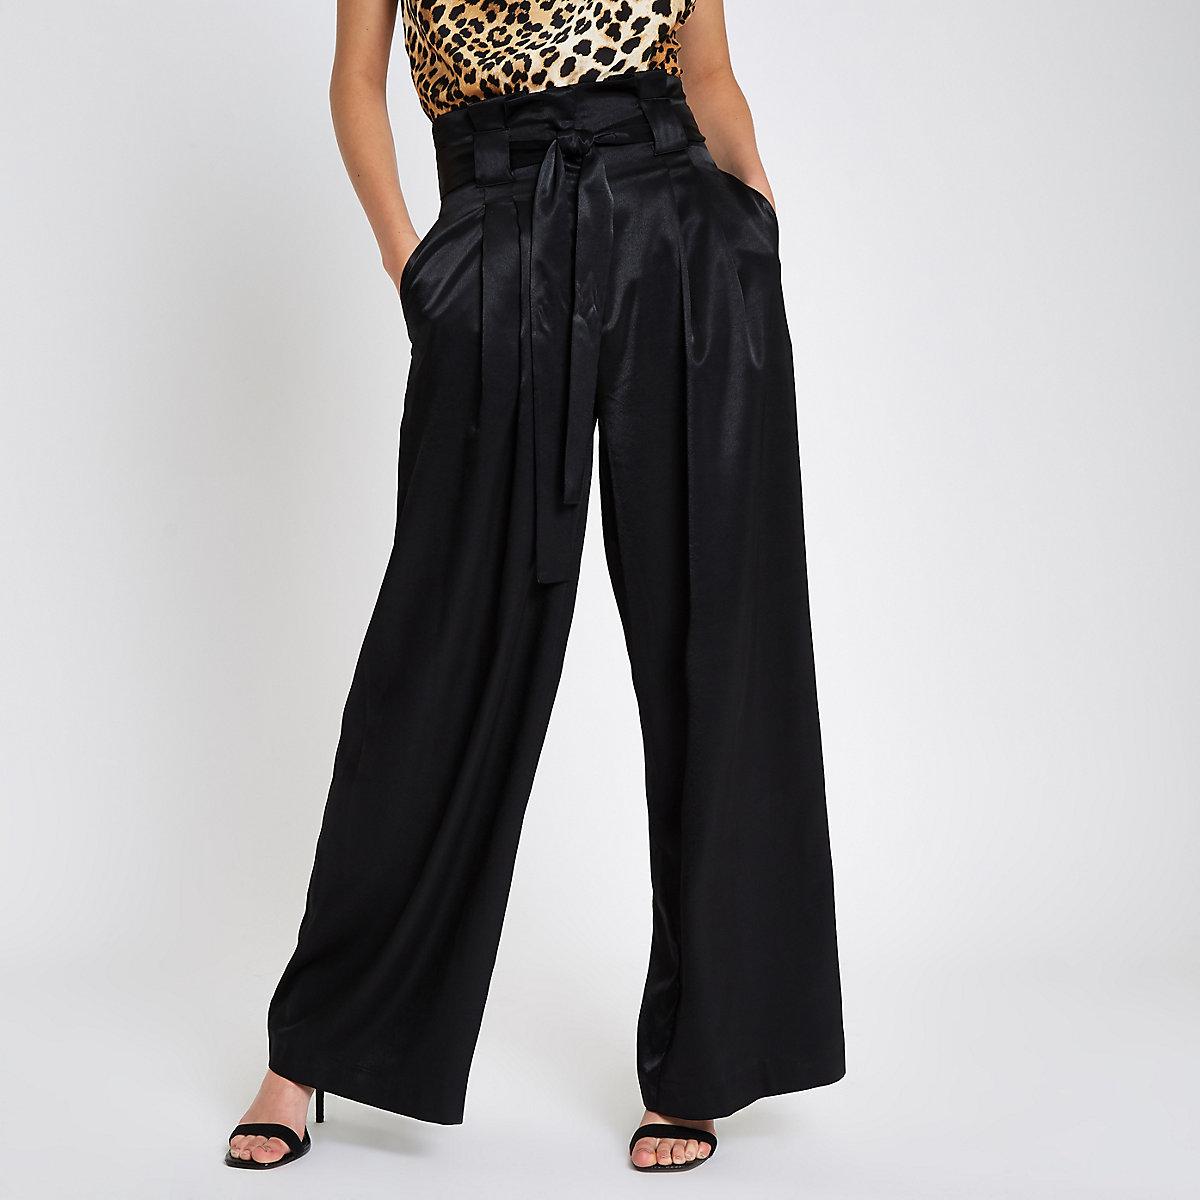 Black paperbag tie waist wide leg trousers